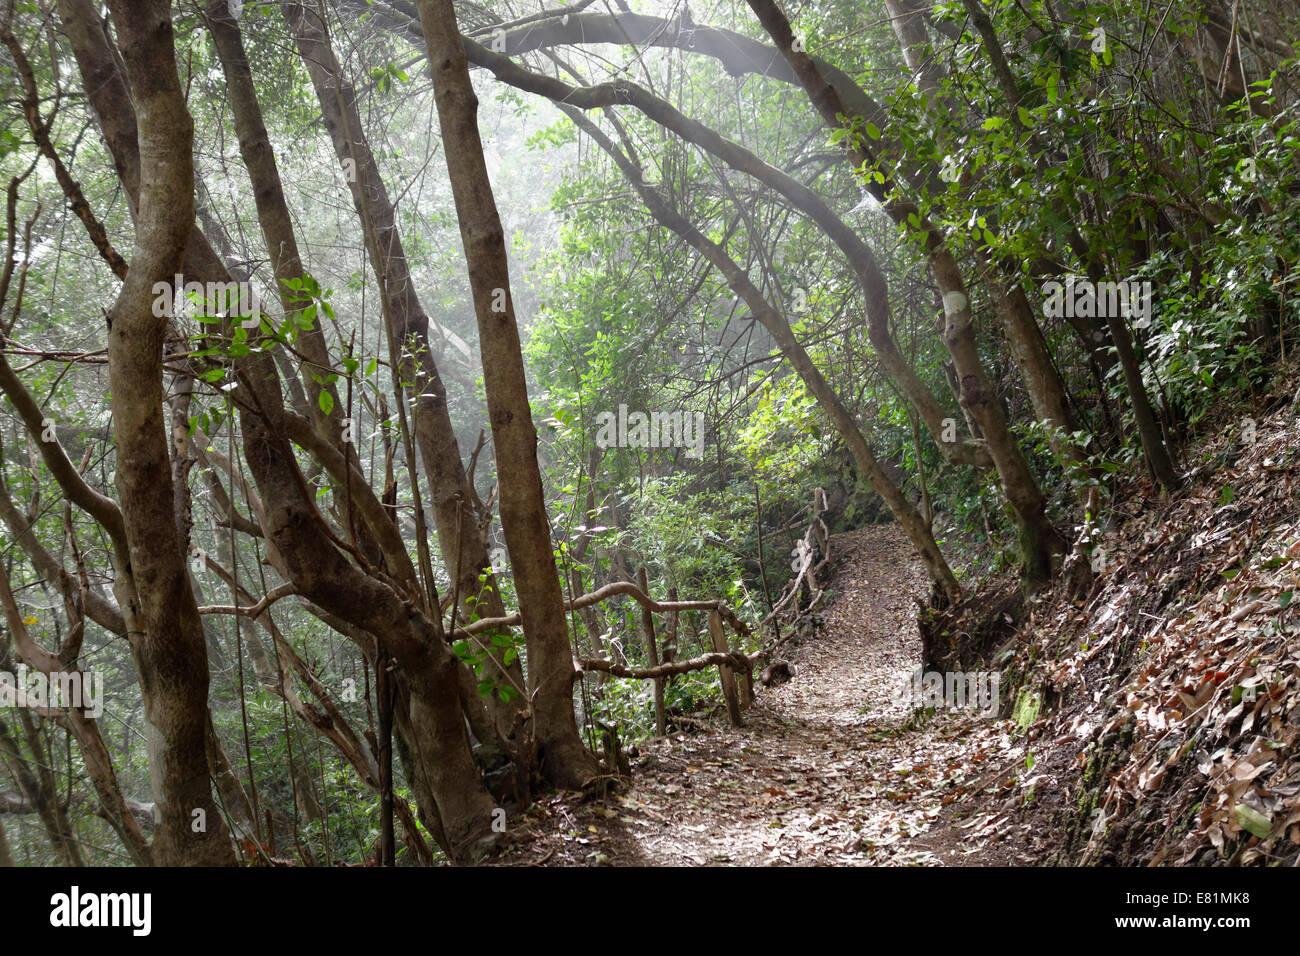 Wanderweg in den Lorbeerwald Los Tilos Biosphärenreservat, in der Nähe von Los Sauces, La Palma, Kanarische Inseln, Stockfoto